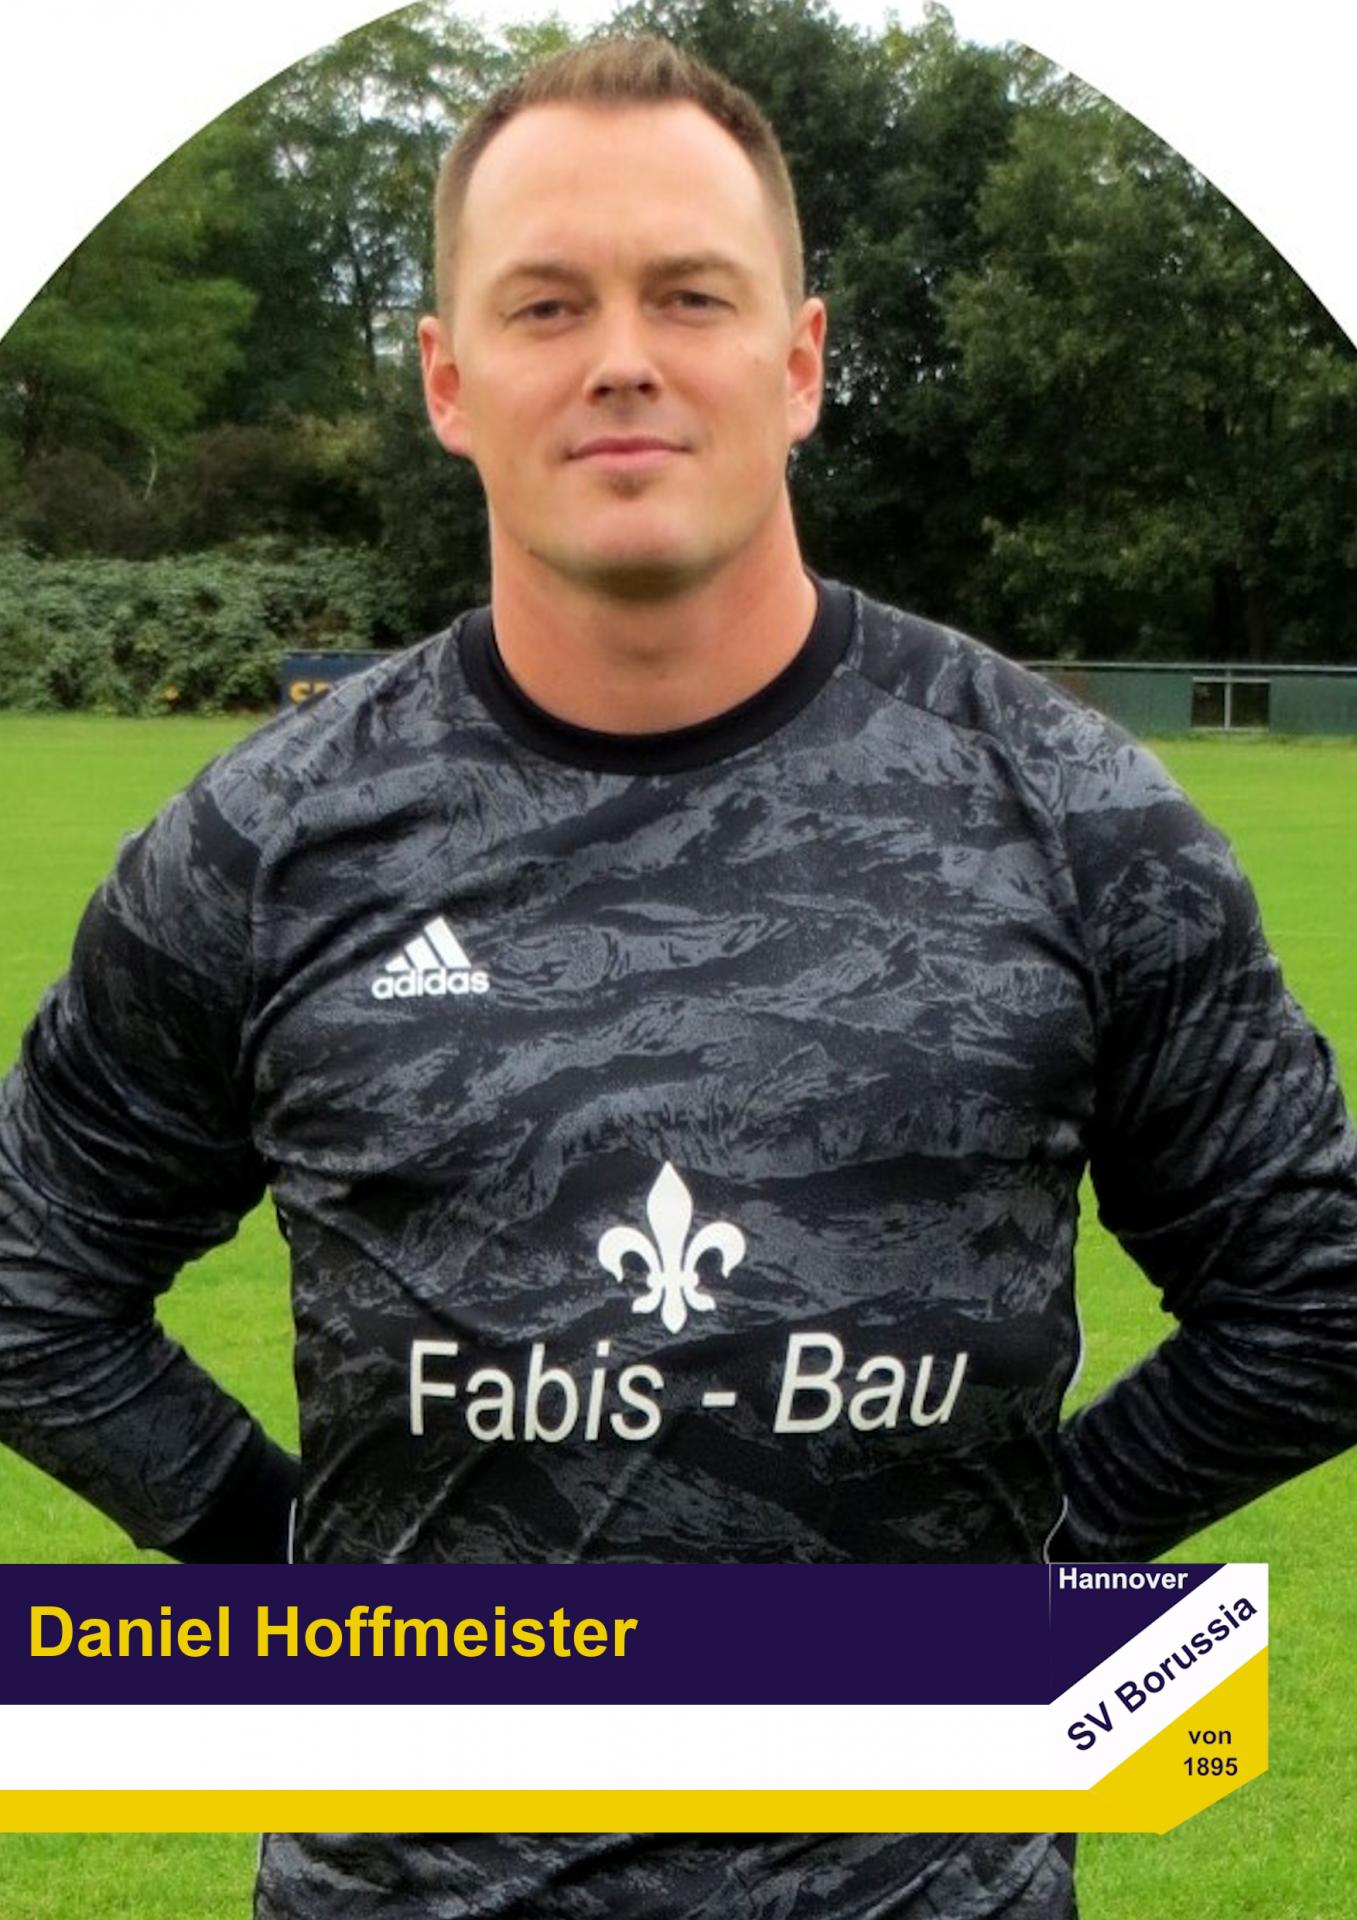 Daniel Hoffmeister